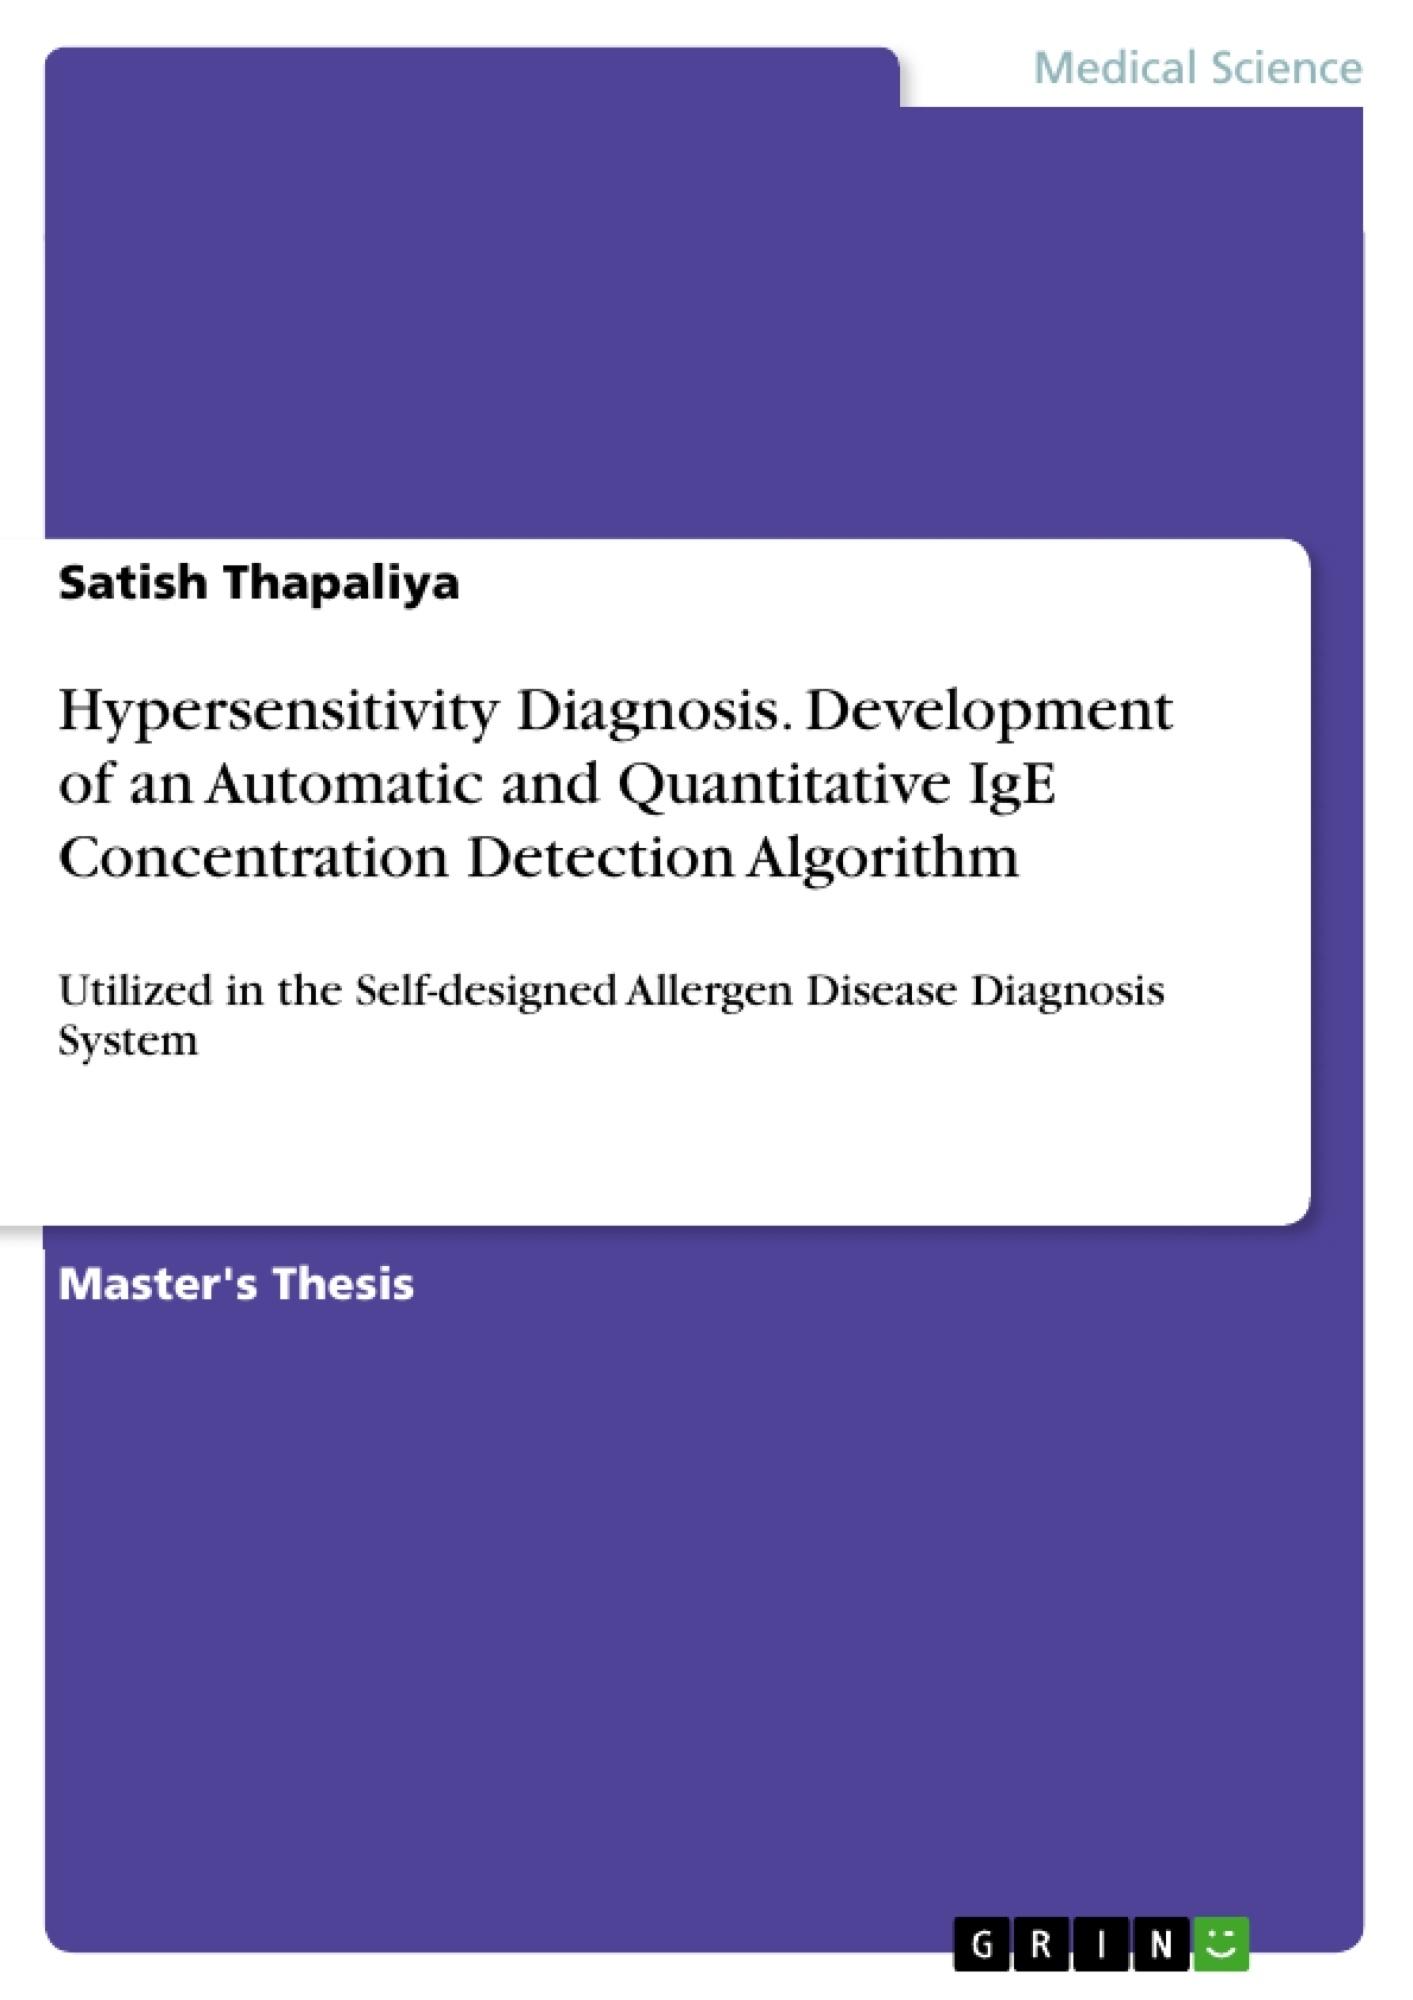 Title: Hypersensitivity Diagnosis. Development of an Automatic and Quantitative IgE Concentration Detection Algorithm